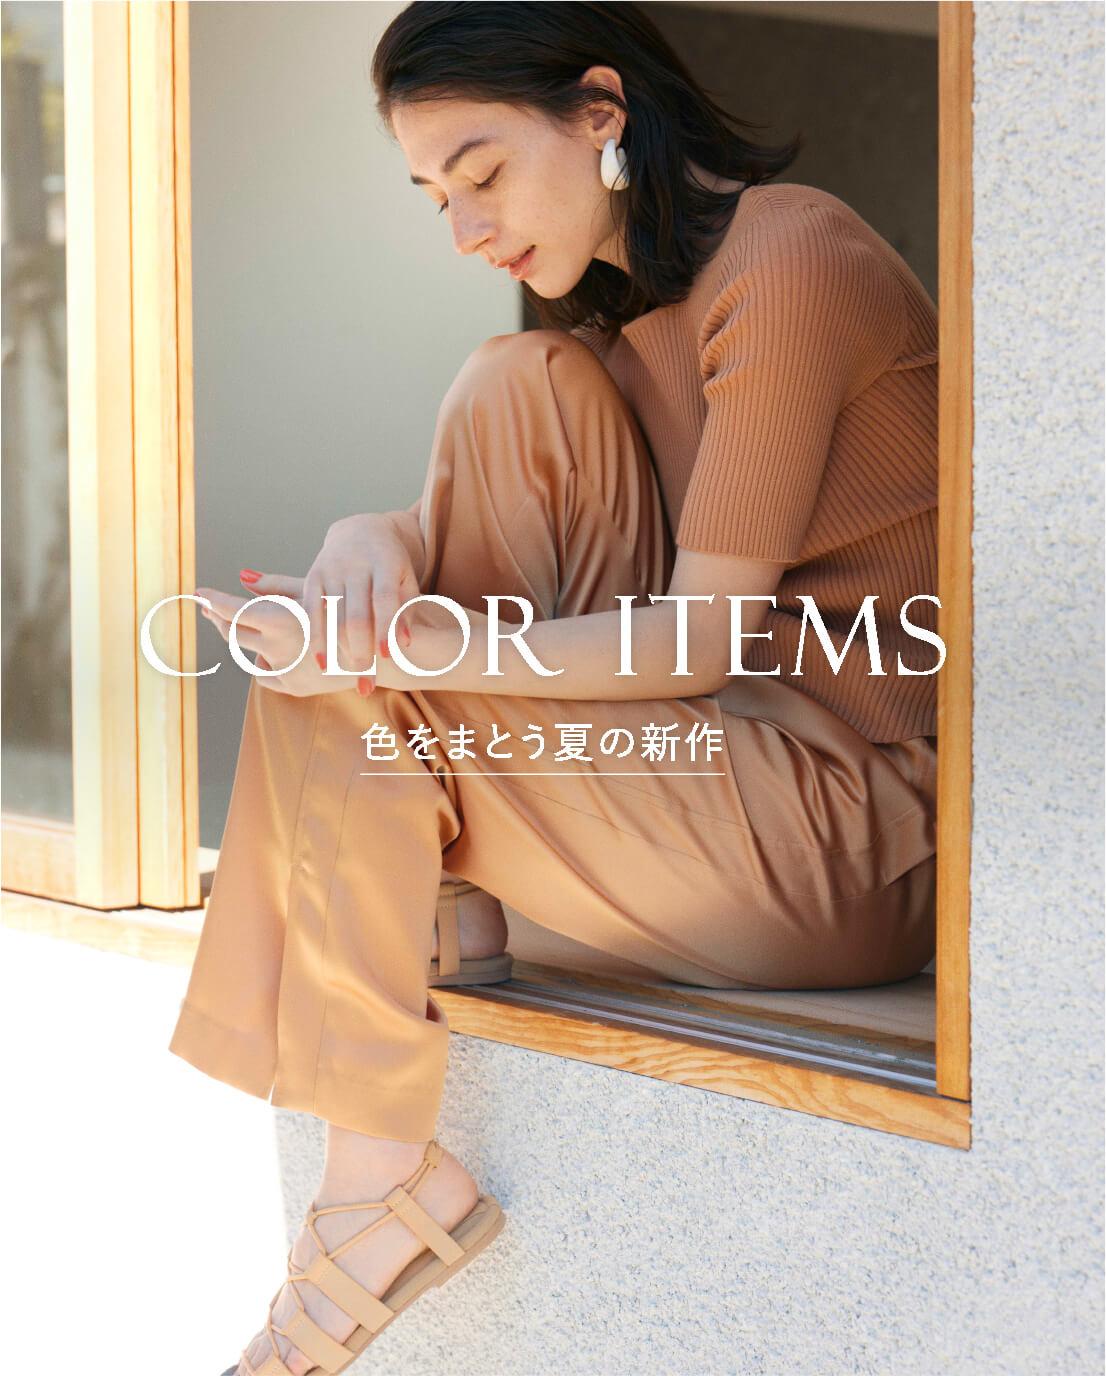 COLOR ITEMS 色をまとう夏の新作